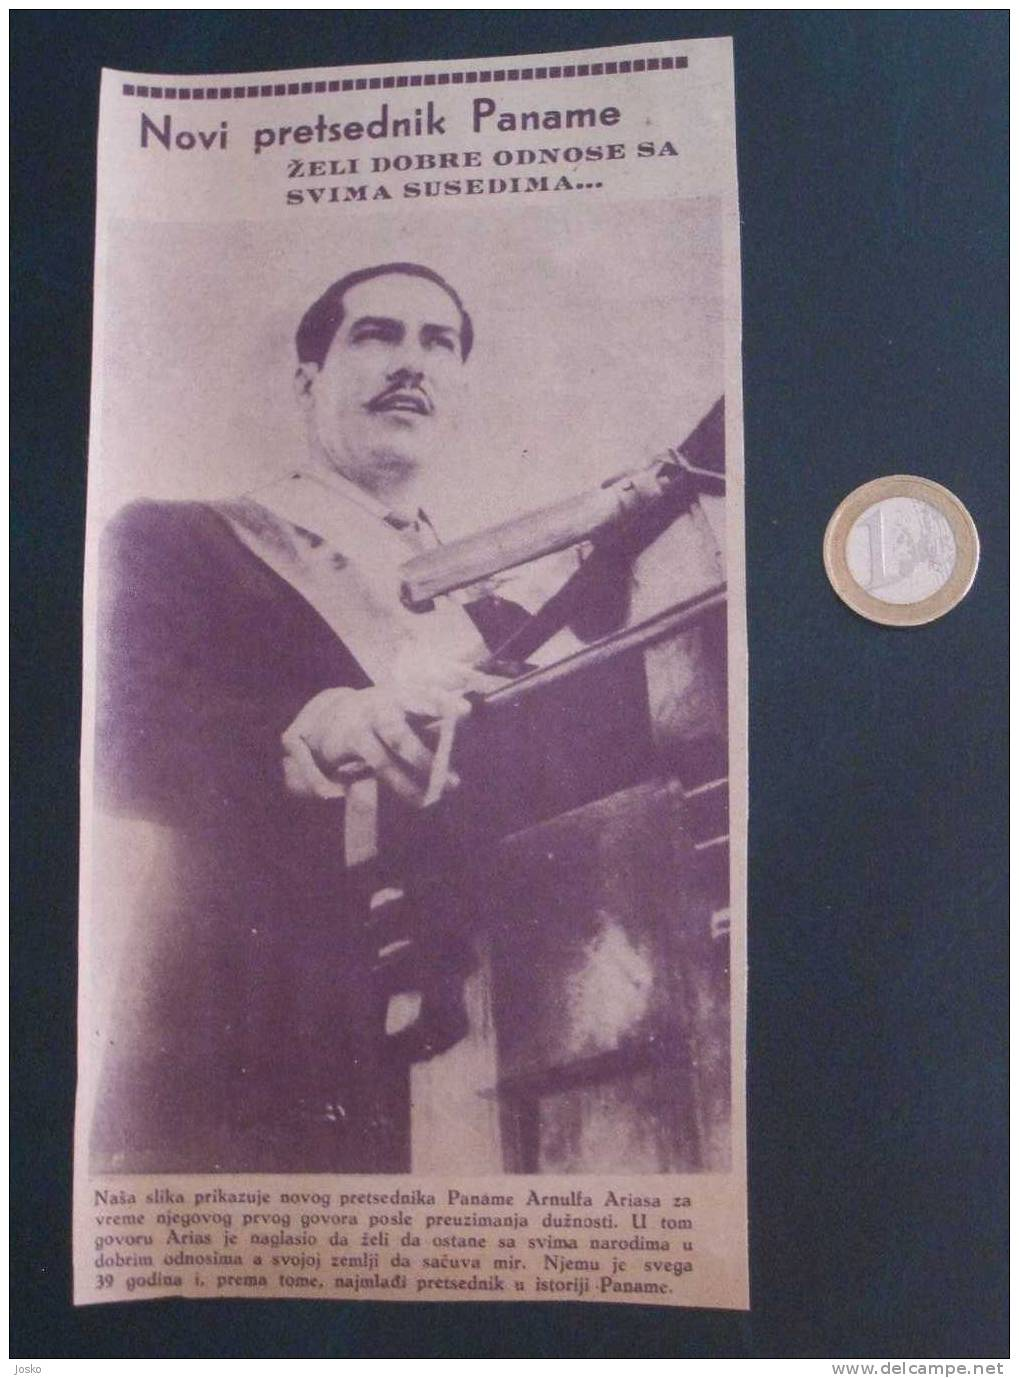 "ARNULFO ARIAS New Panama President - Original Newspaper Clipping From \"" Panorama \"" Newspaper - Yugoslavia 1940. - Magazines: Subscriptions"